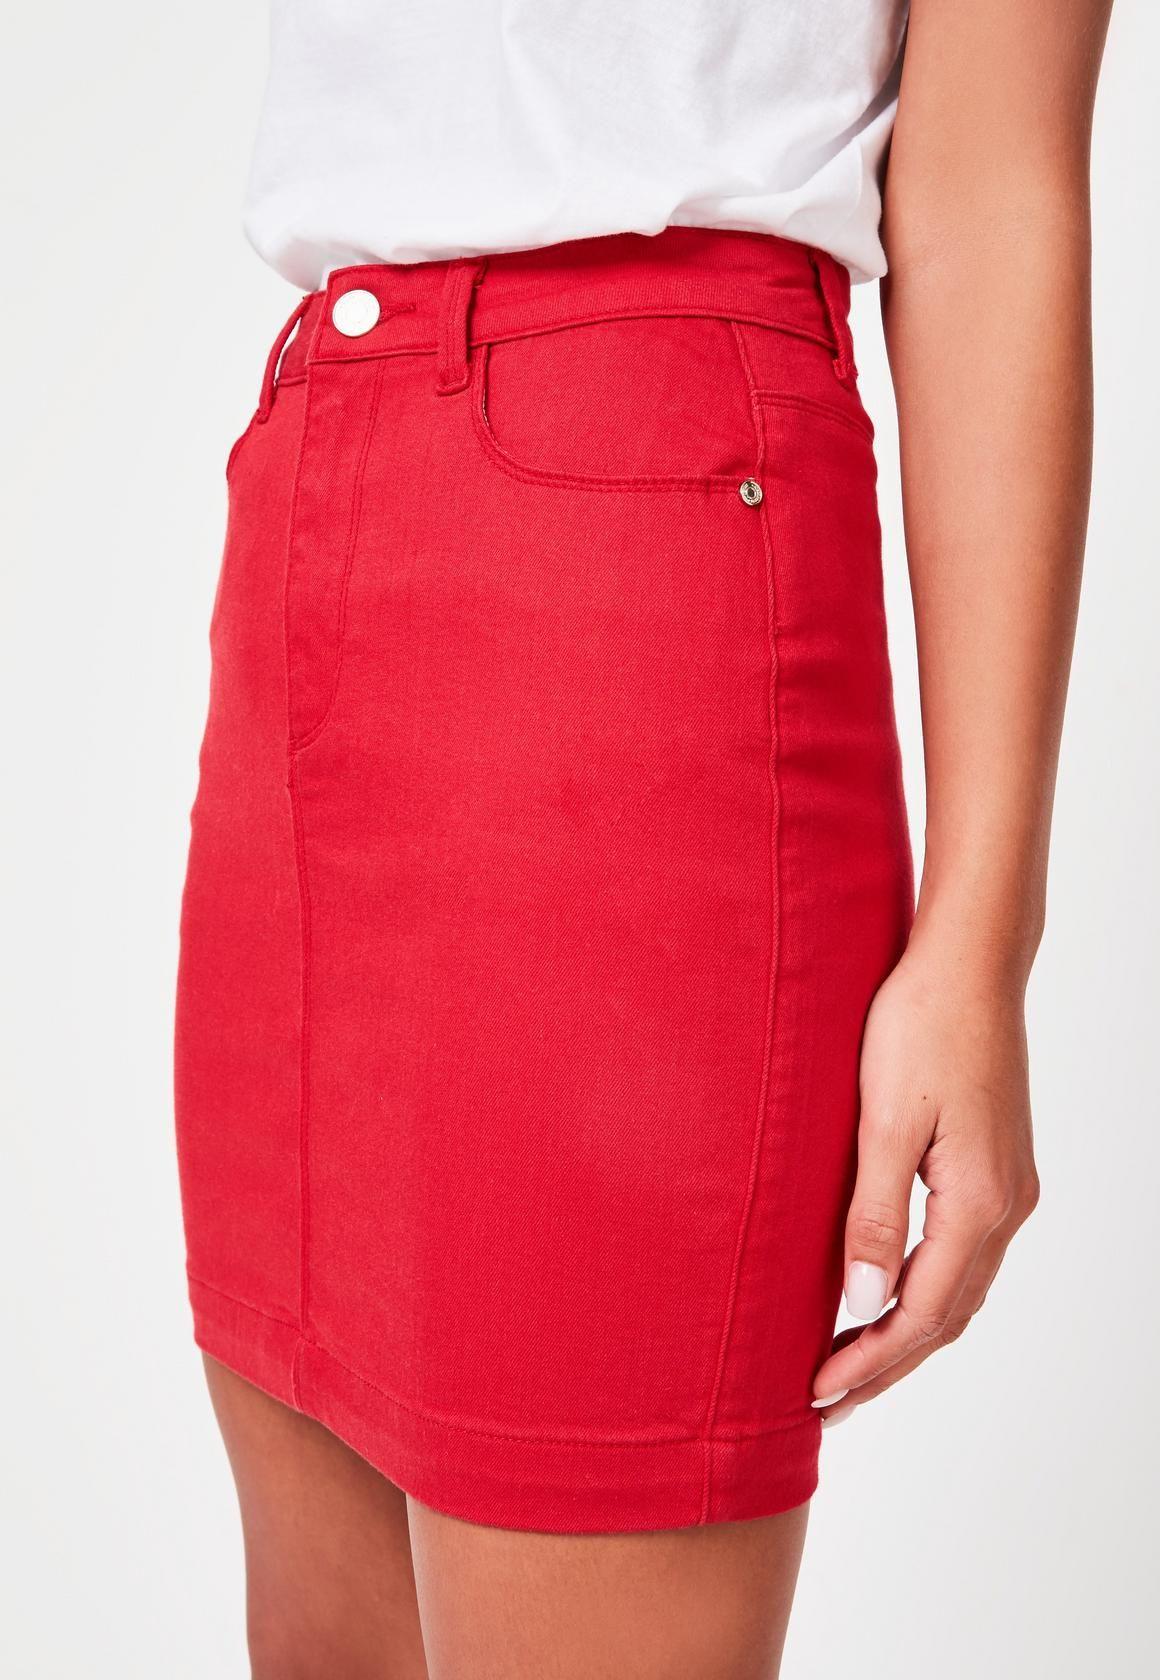 1403d9872bad81 Red Denim Super Stretch Mini Skirt | mOdE euh ... | Mini skirts ...